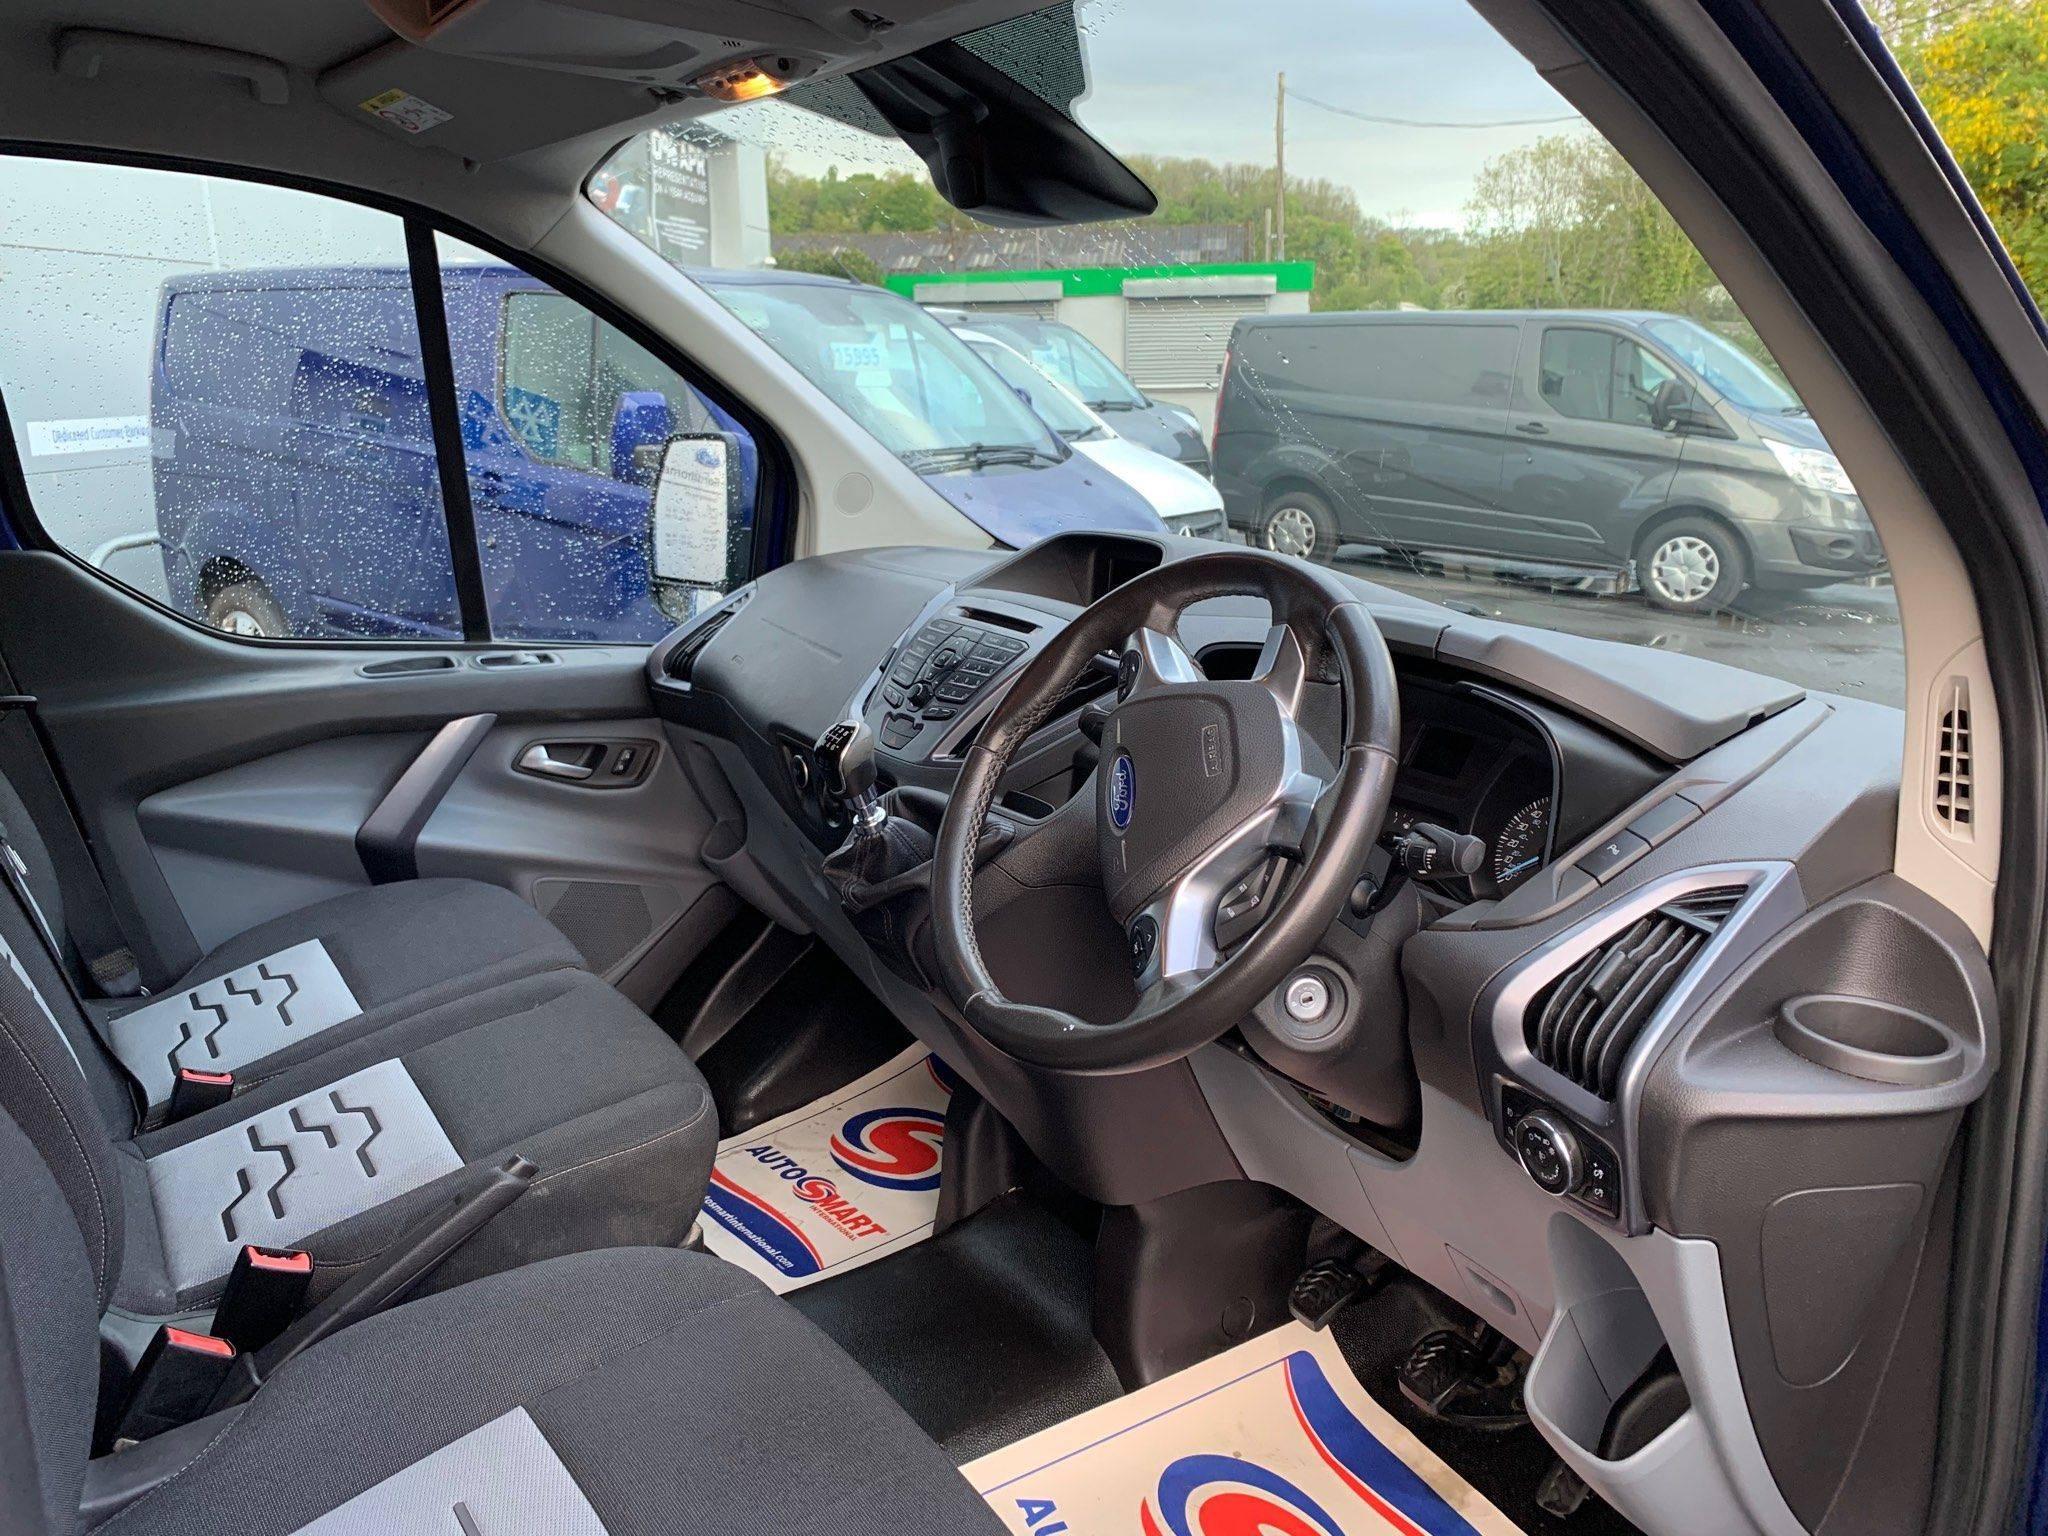 2017 Ford Transit Custom TDCi 270 Limited full